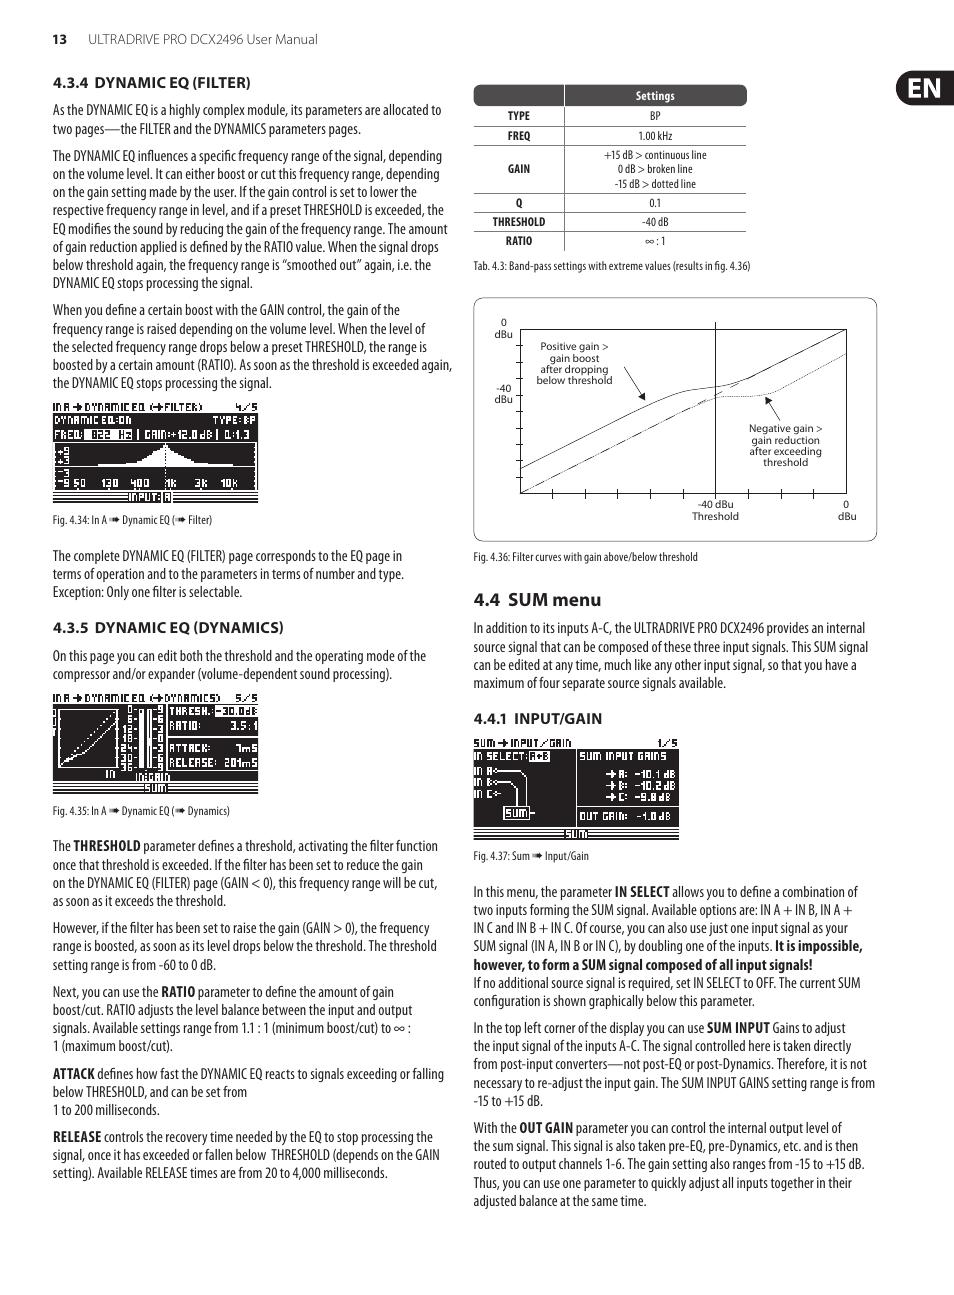 behringer dcx2496 instruction manual free owners manual u2022 rh wordworksbysea com 6.7 Cummins Manual Old Cummins Manual